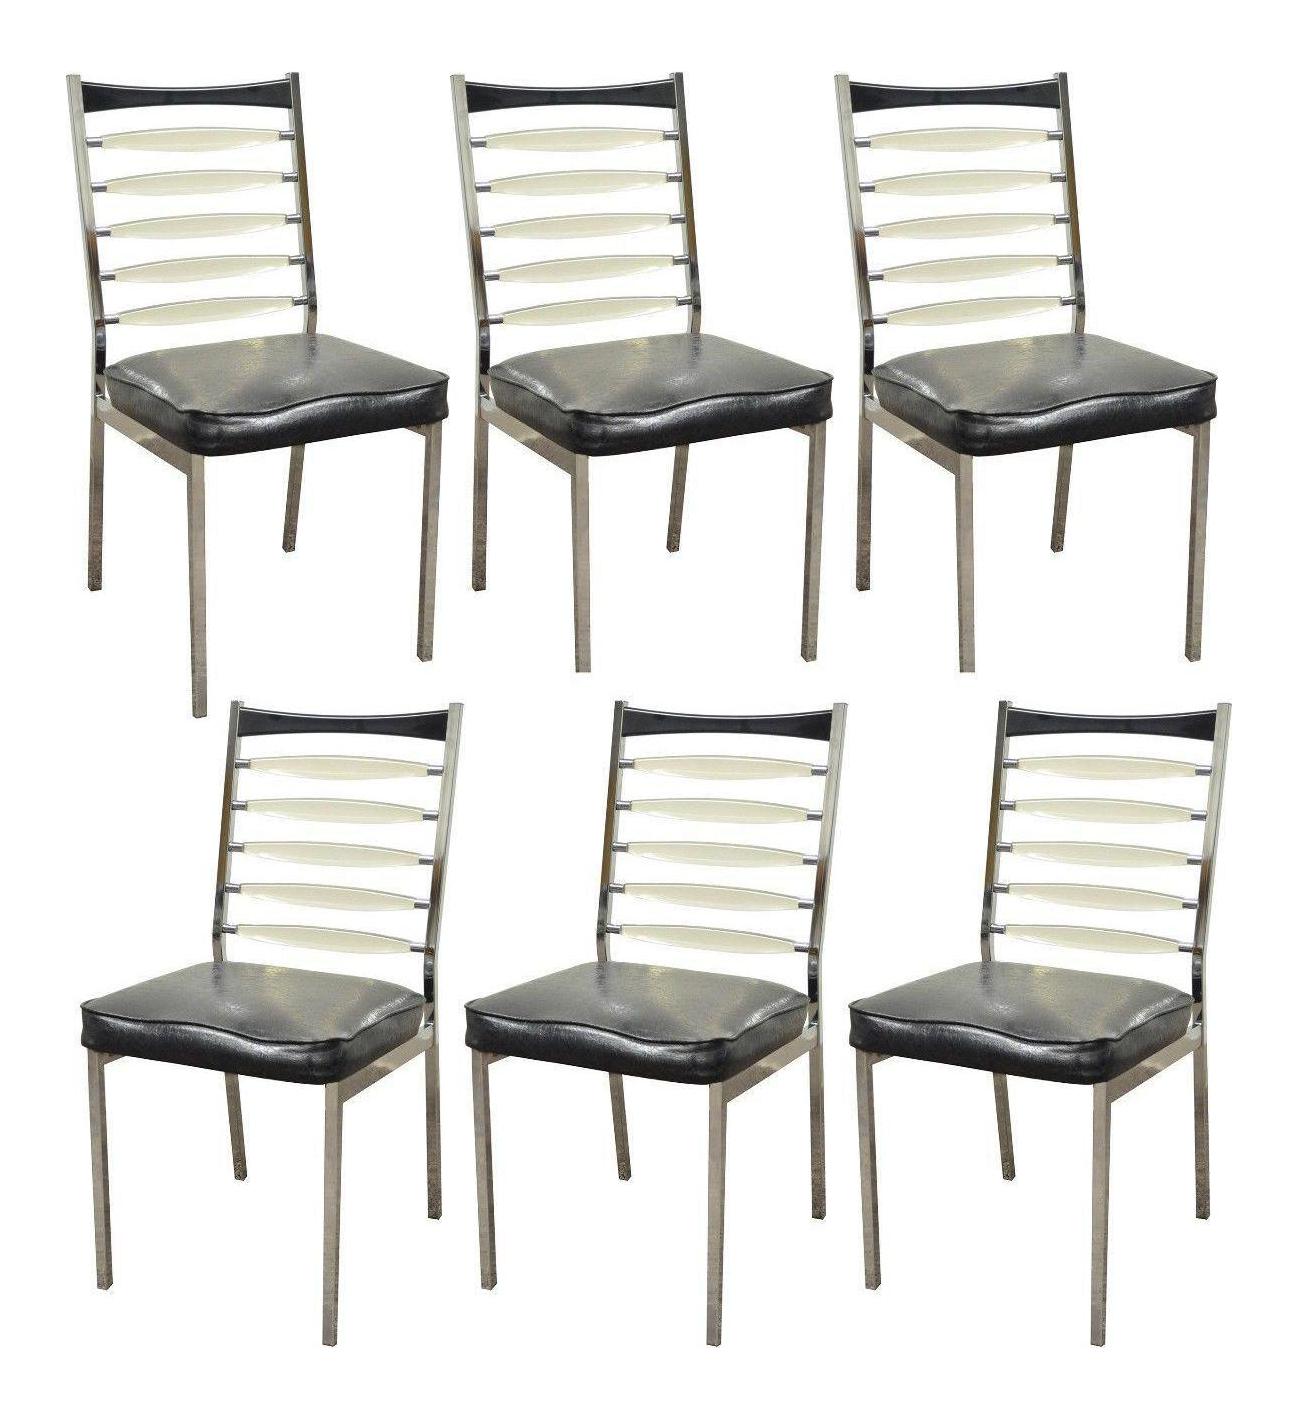 Set 6 Vintage Mid Century Modern Daystrom Chrome Lucite Ladderback Dining  Chairs